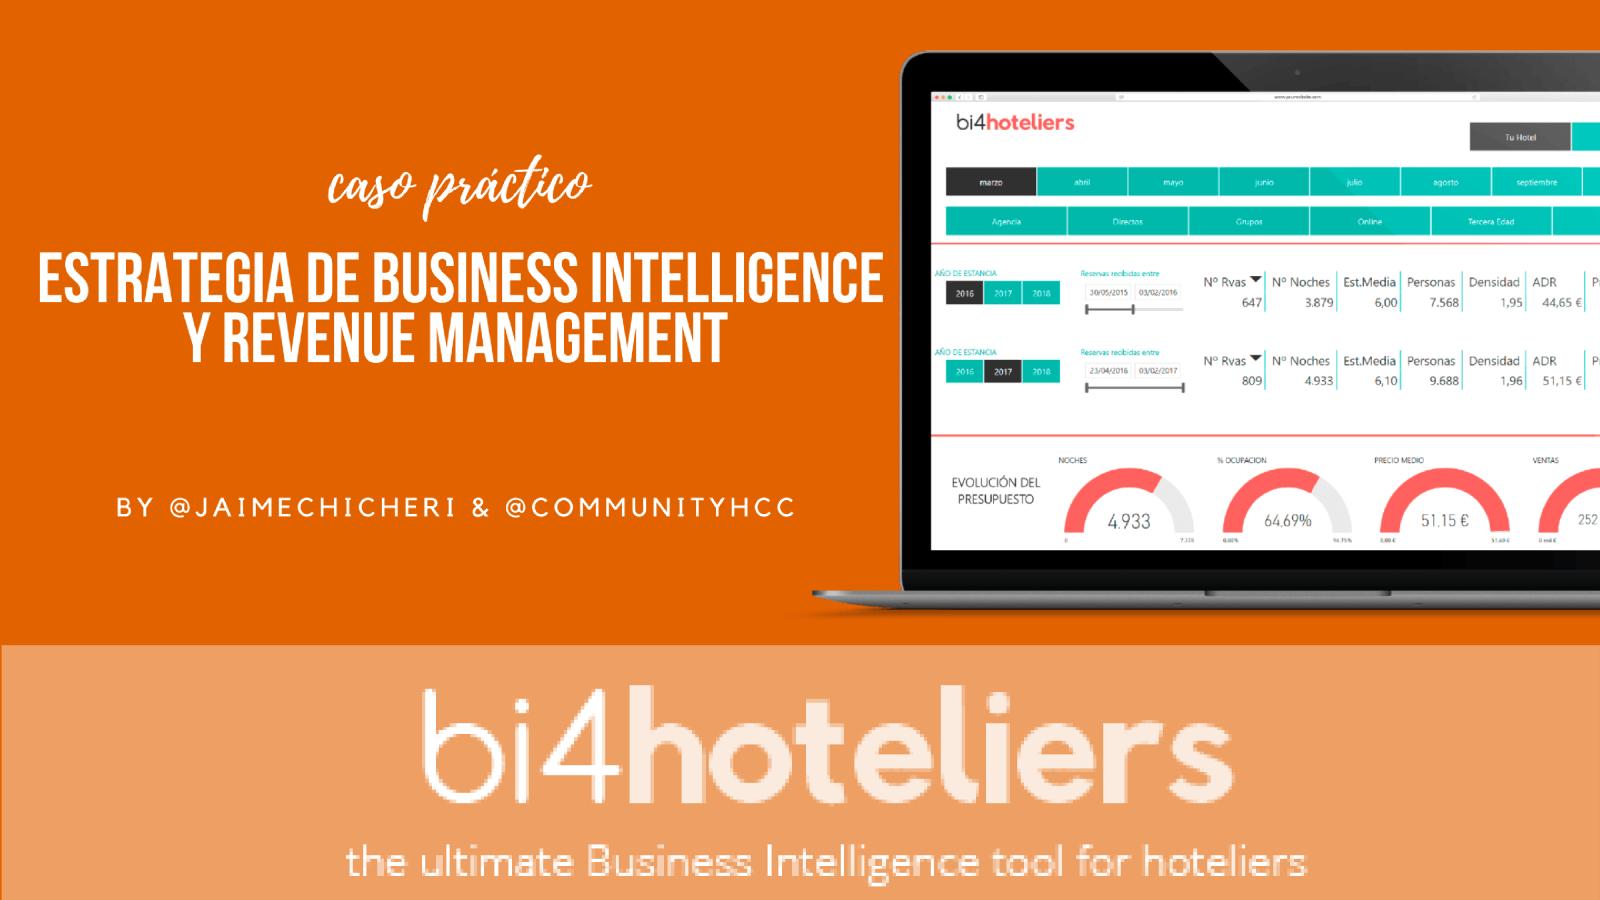 Caso práctico de Business Intelliigence y Revenue Management con bi4Hoteliers